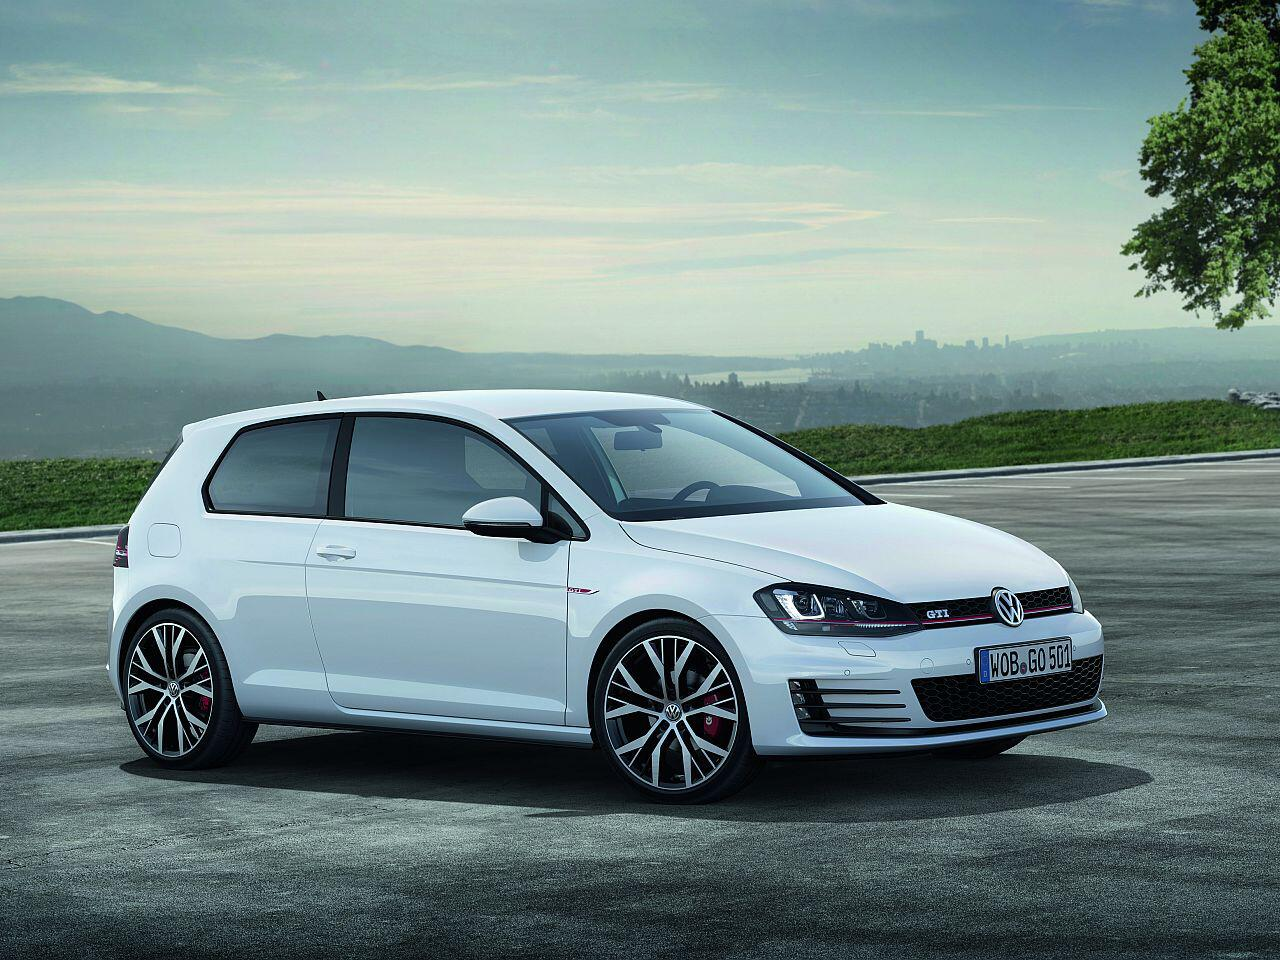 Bild zu 14. Platz: VW Golf 7 GTI